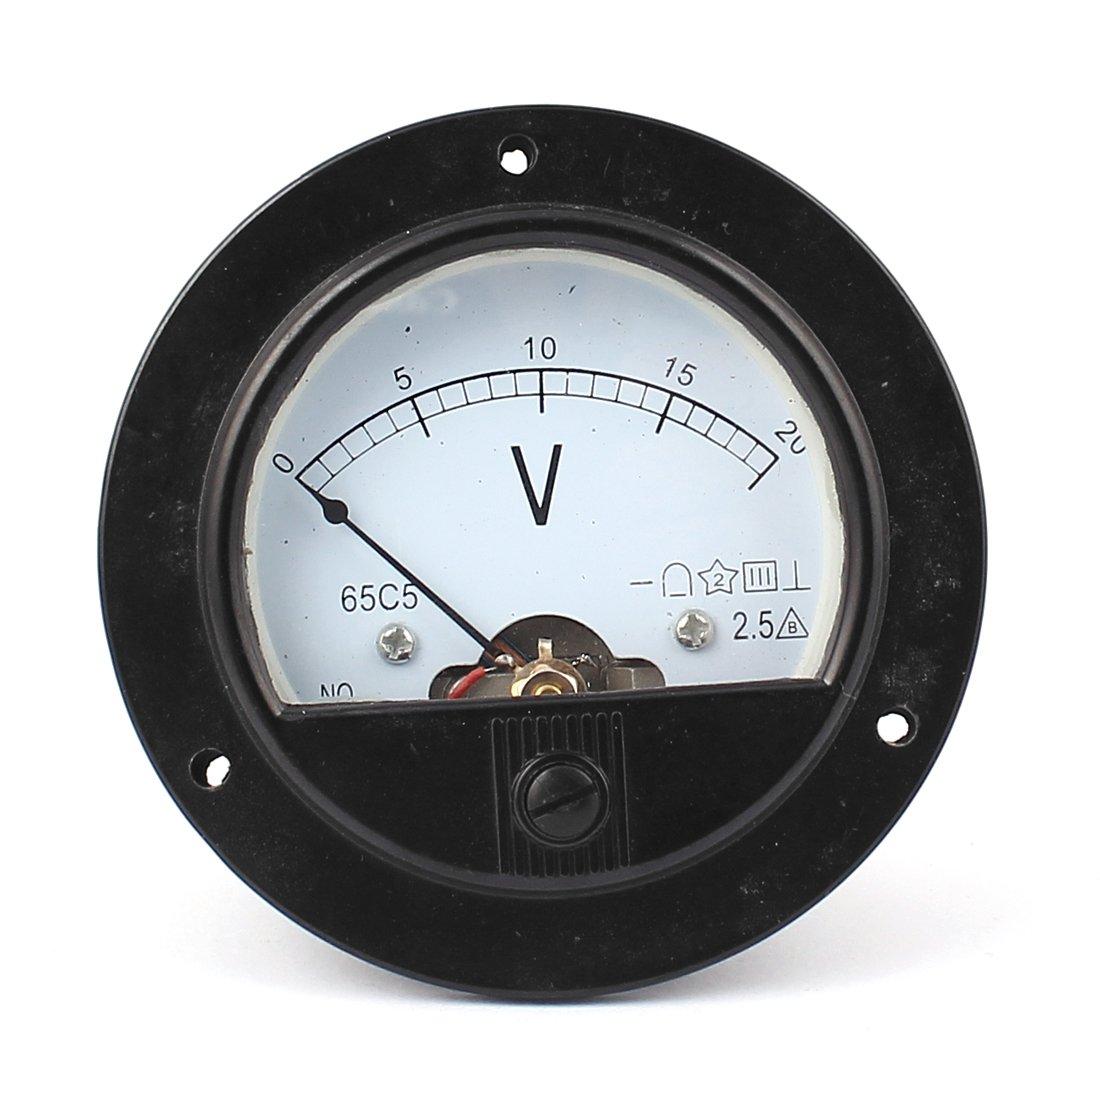 Sourcingmap Dc 0 20v Rund Simulation Paneel Meter Strom Stromspannung Messer Voltmeter De De Gewerbe Industrie Wissenschaft